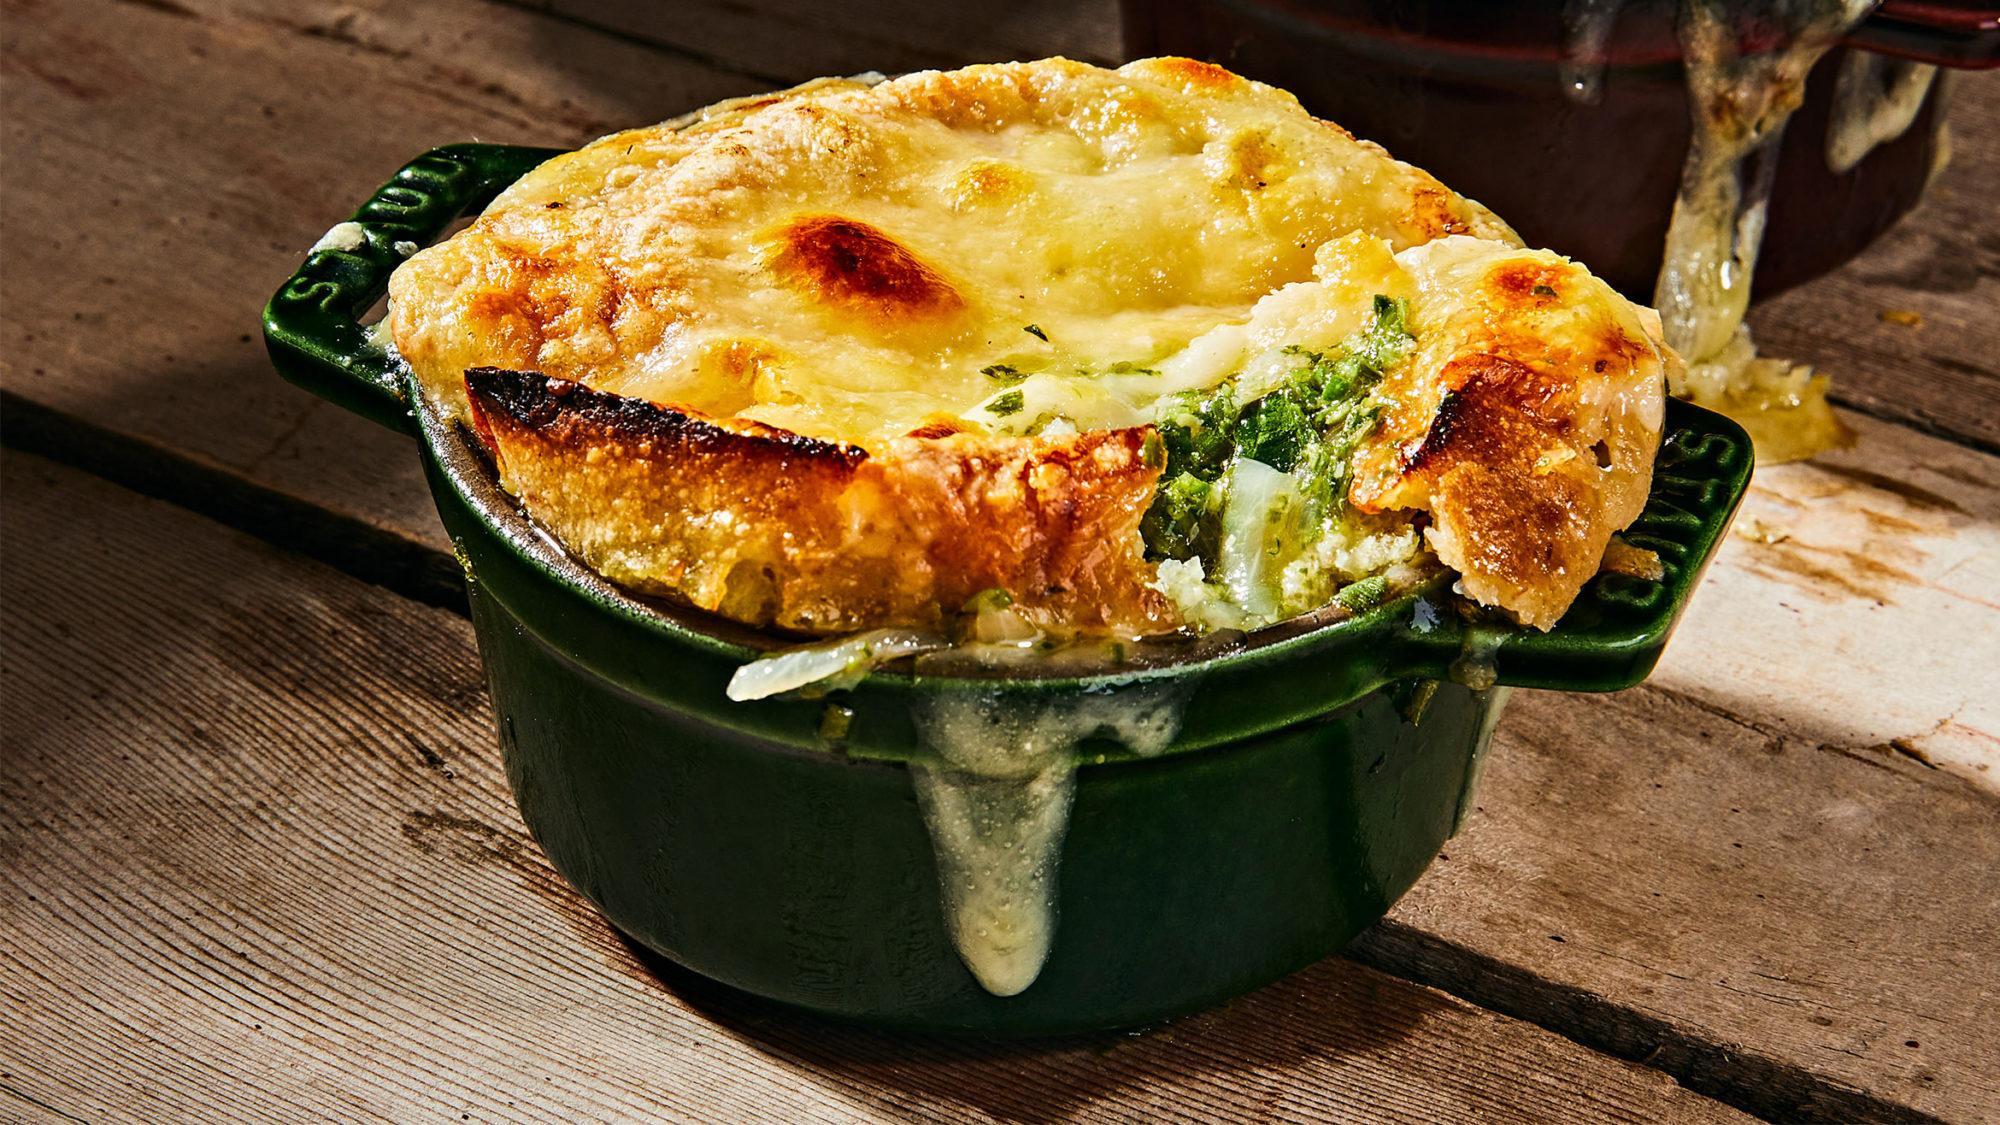 Article-Green-Onion-French-Onion-Soup-Recipe